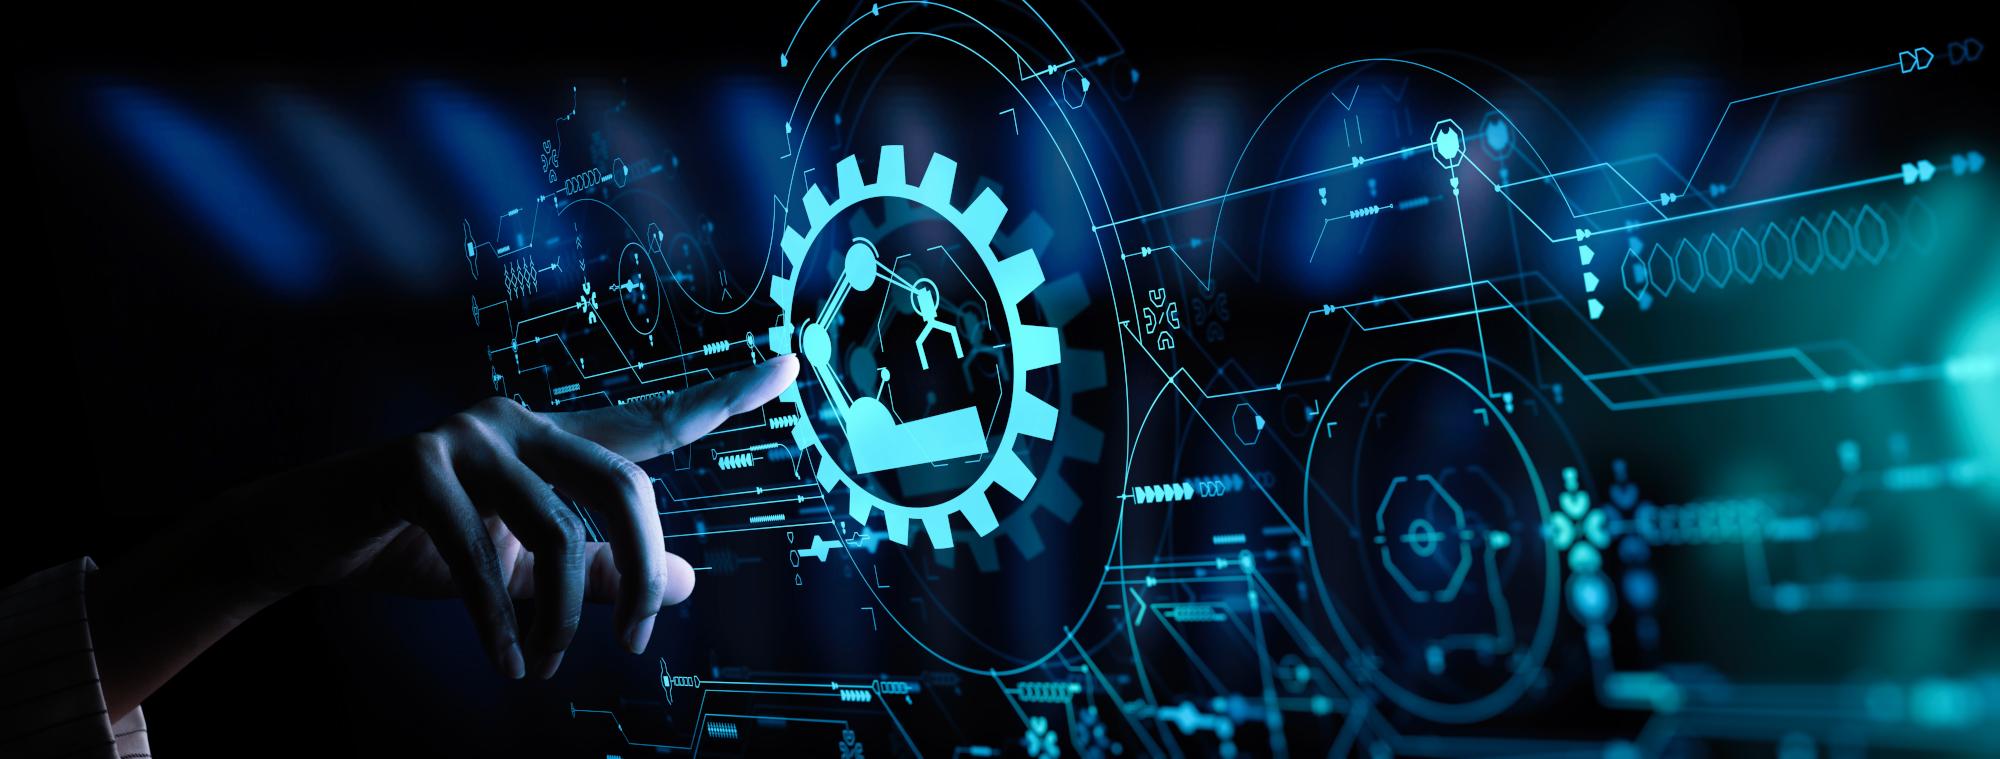 SL Controls Digital Transformation Solutions